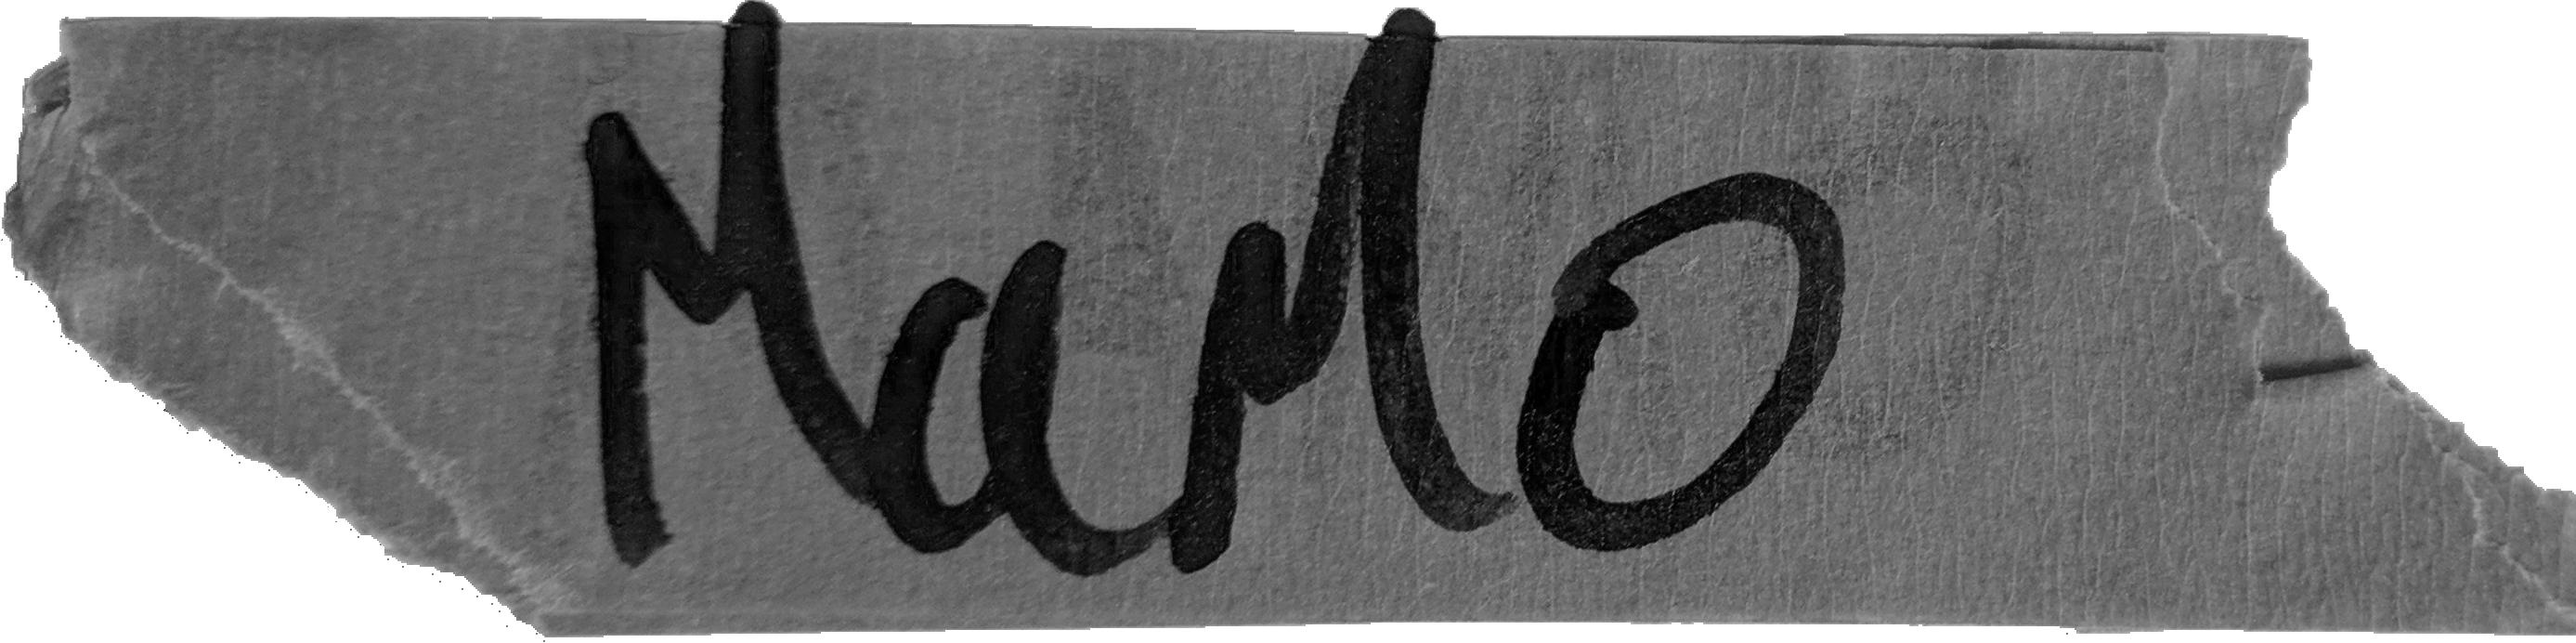 marcus moltzer